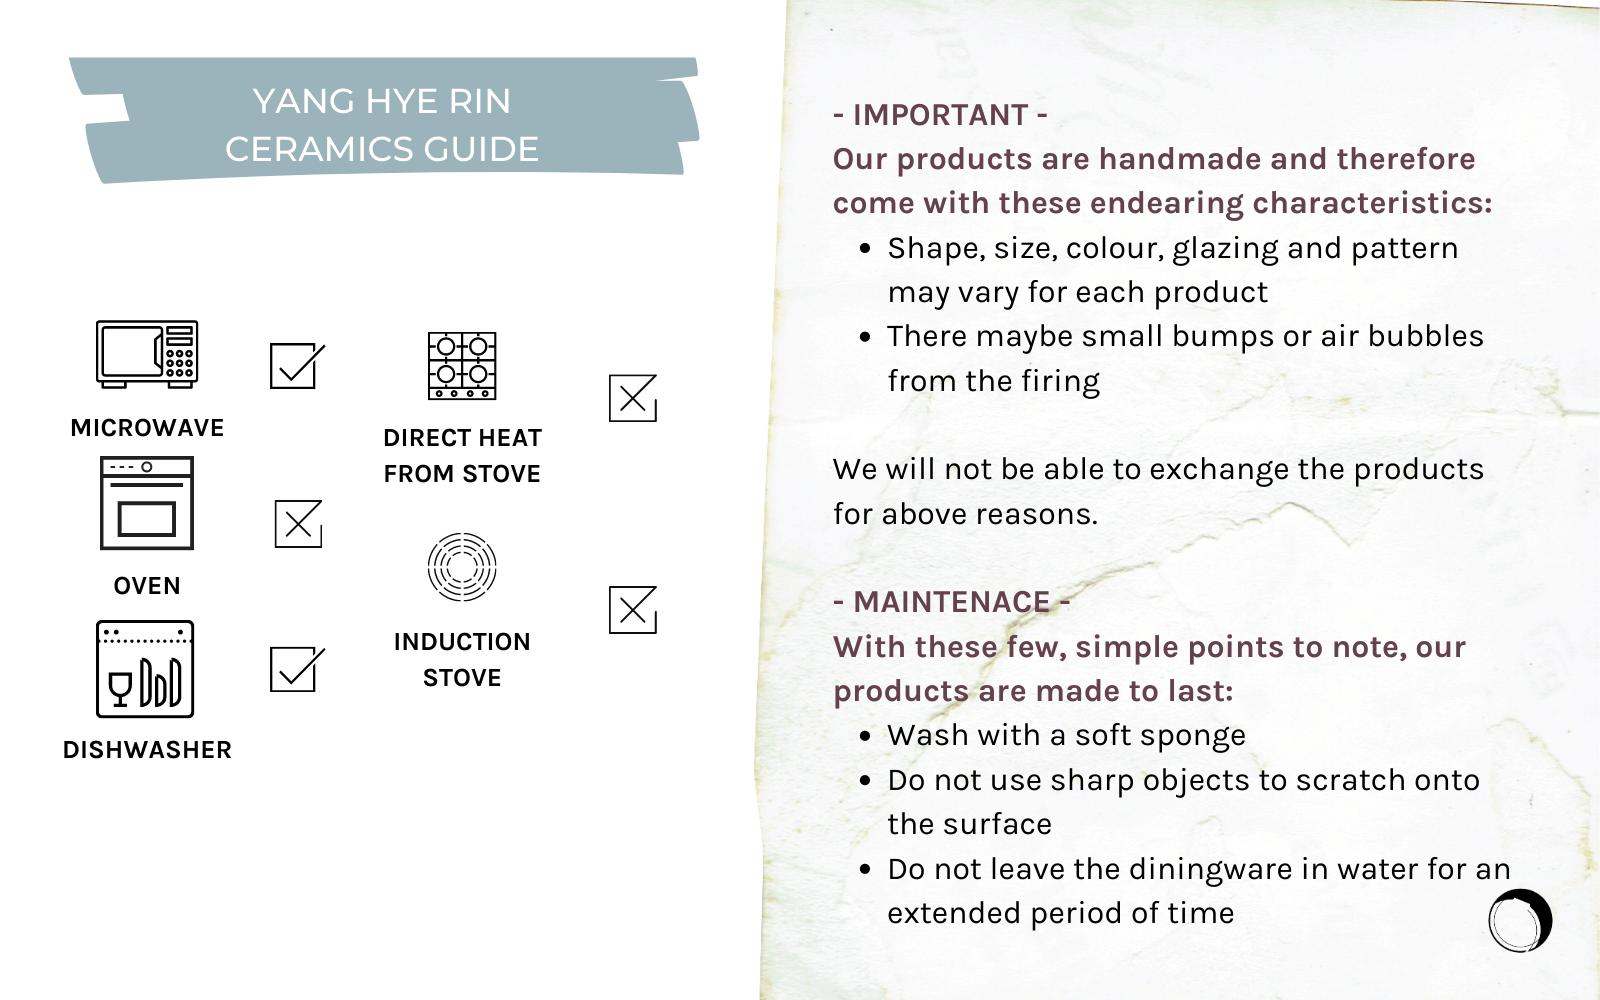 Yang Hye Rin Ceramics Product Care Guide